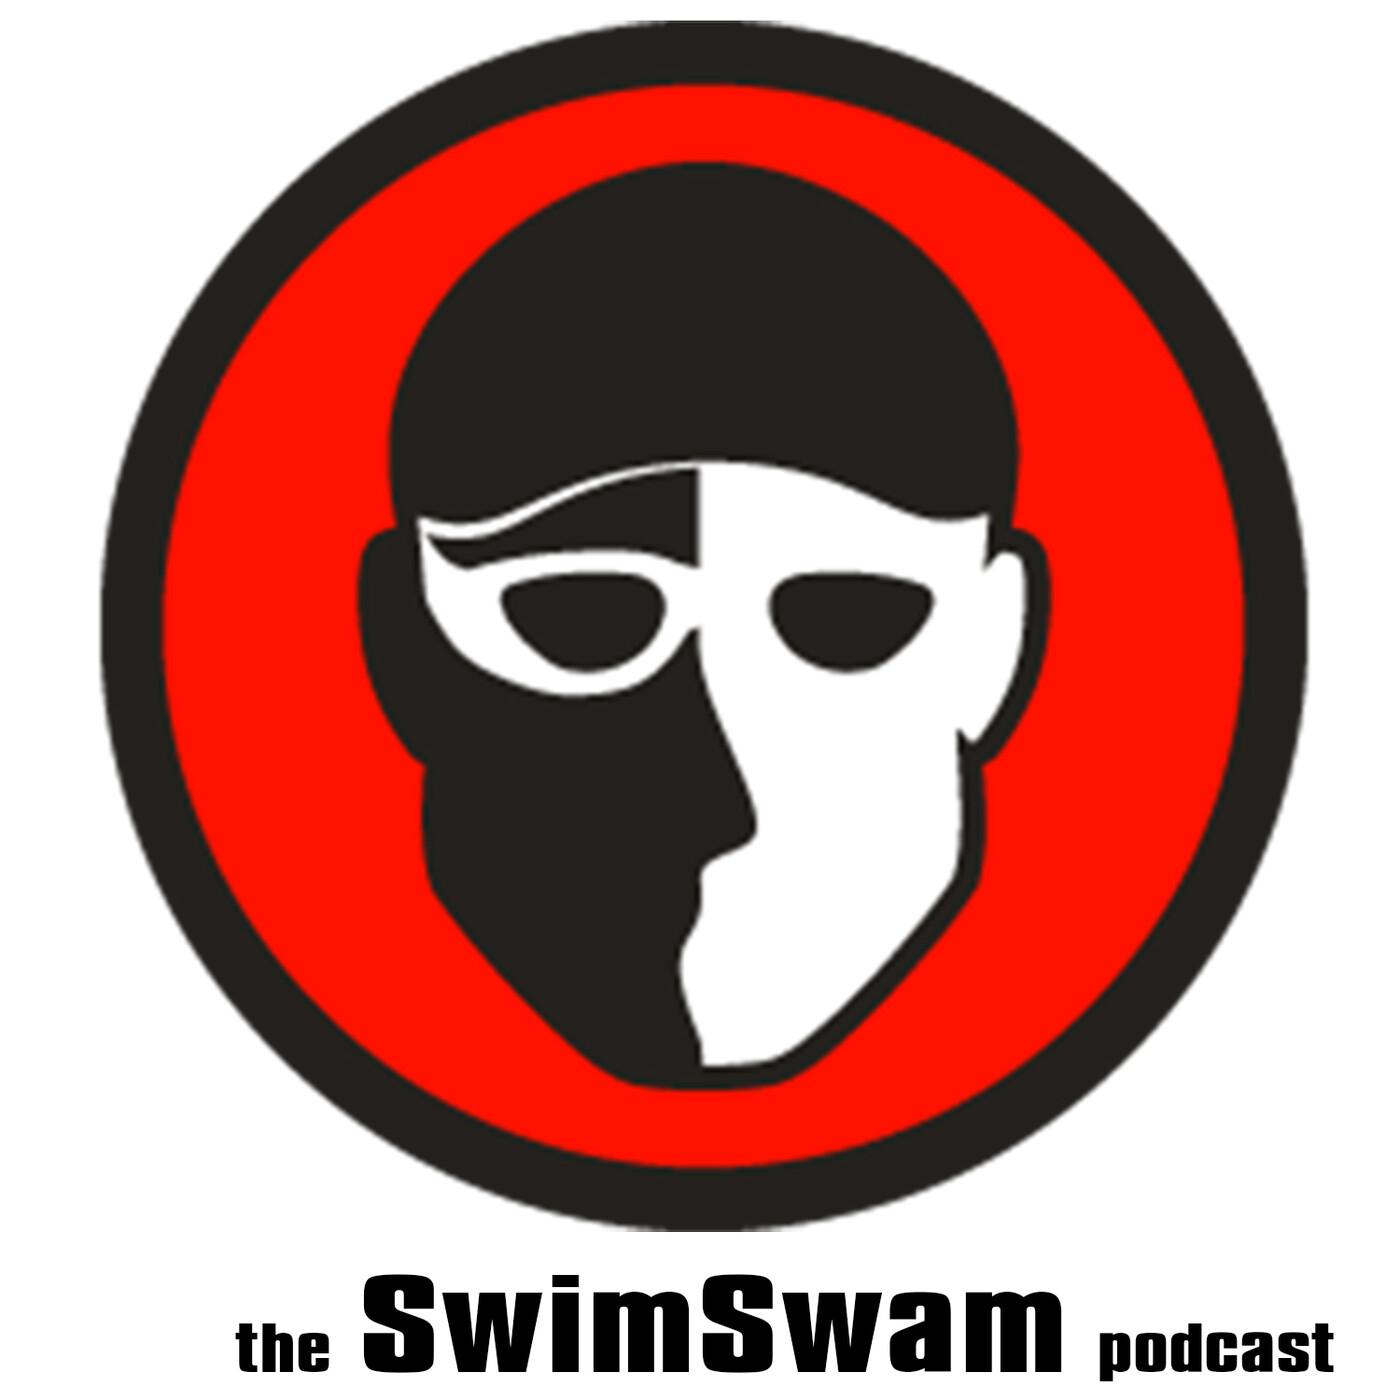 SwimSwam Podcast: Andreas Vazaios Breaks Down Dominant First ISL Match